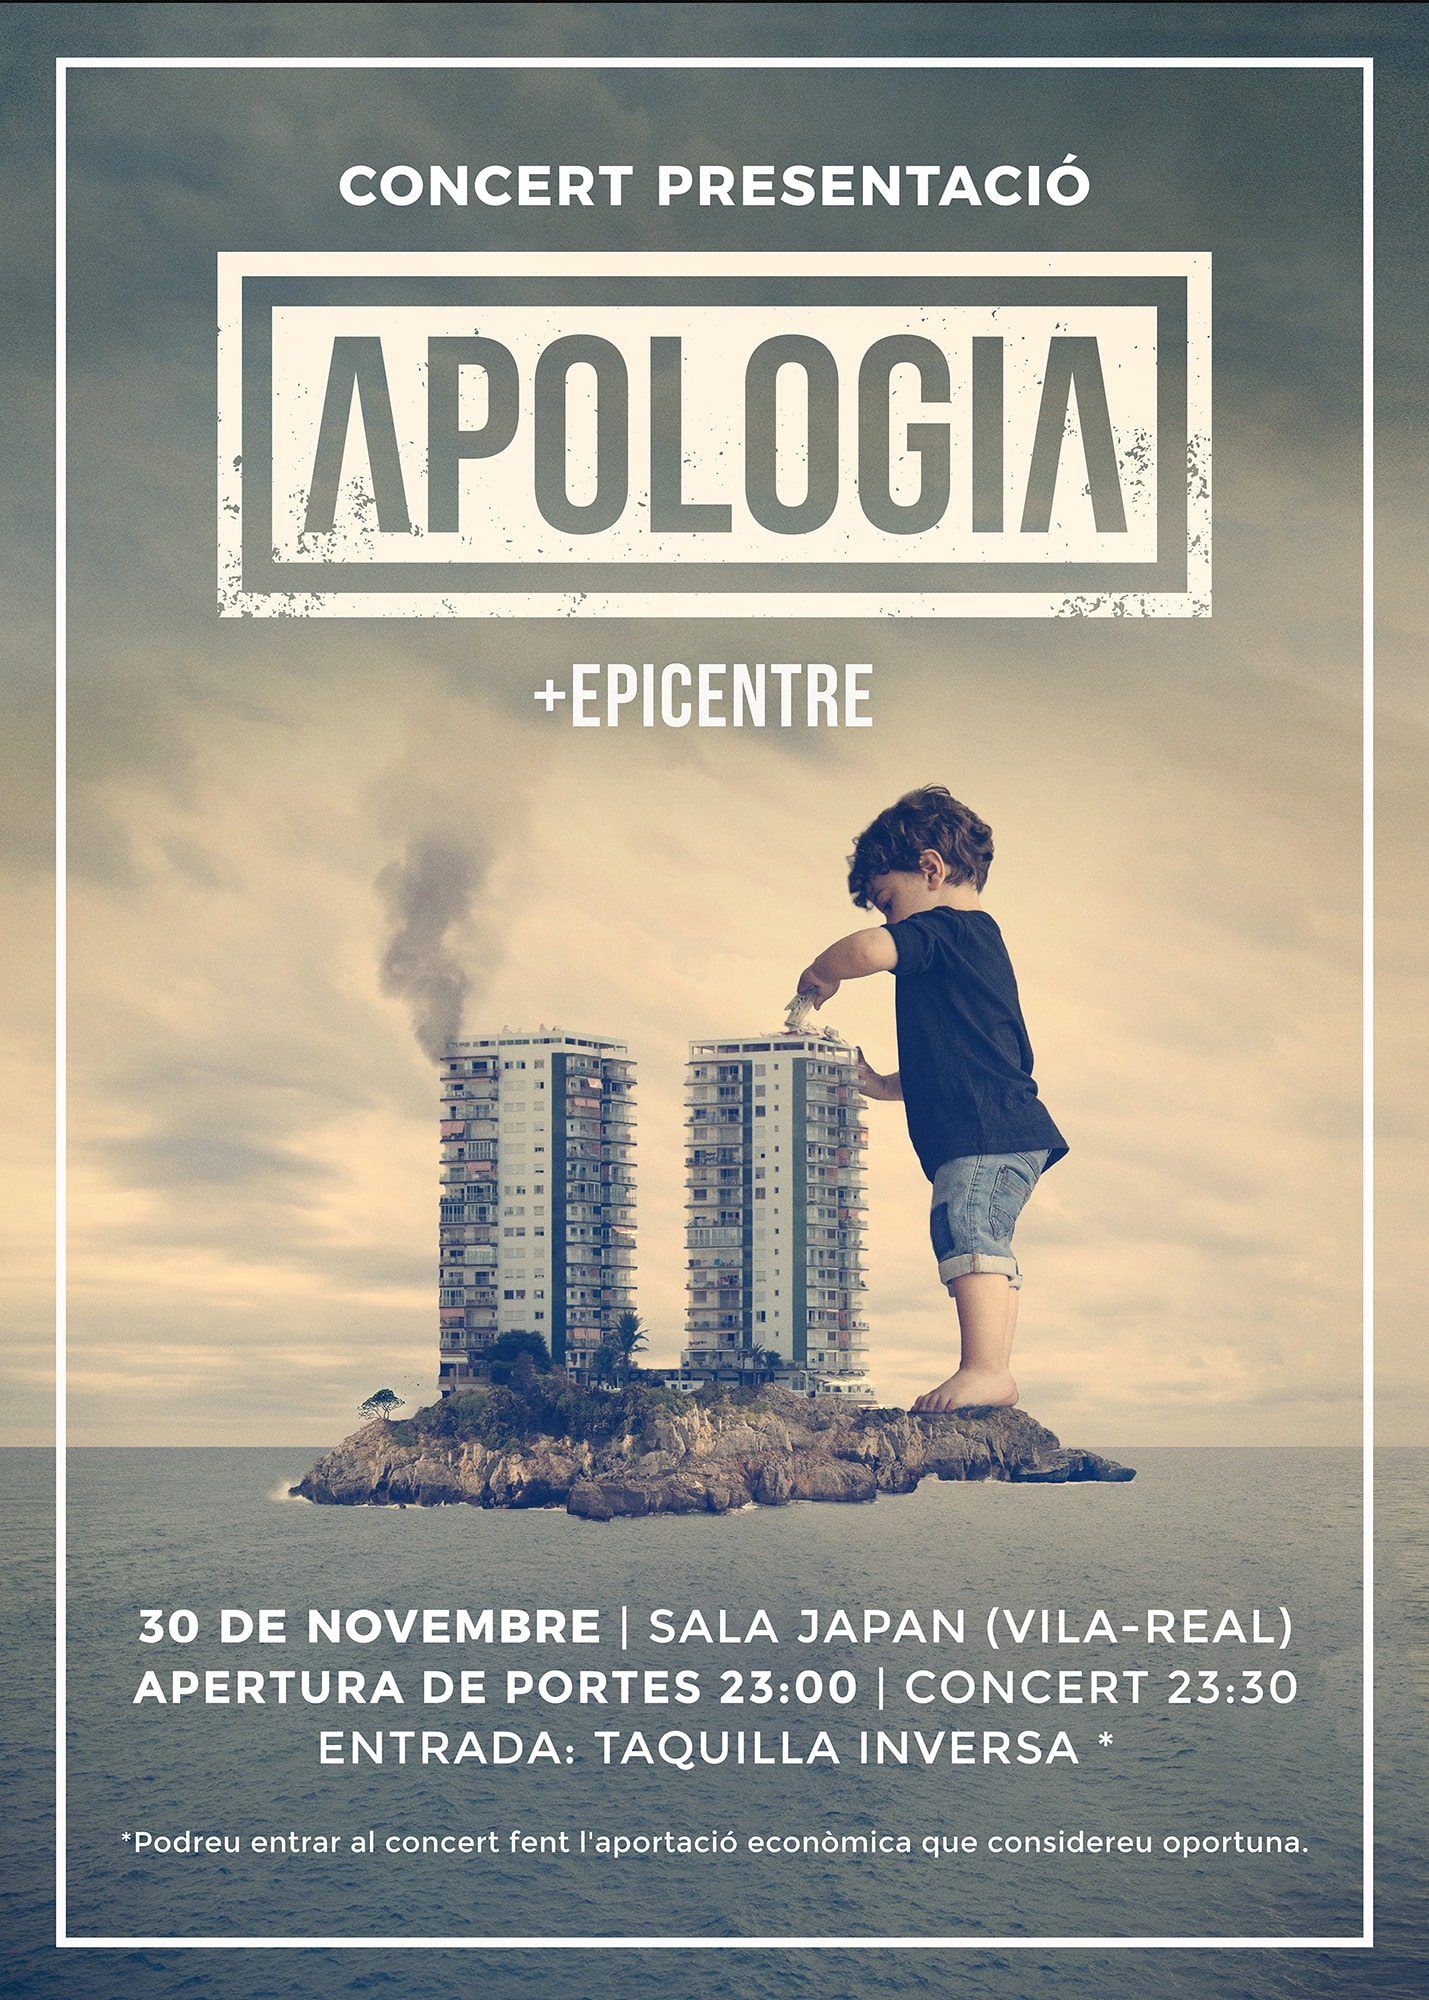 Apologia Concert